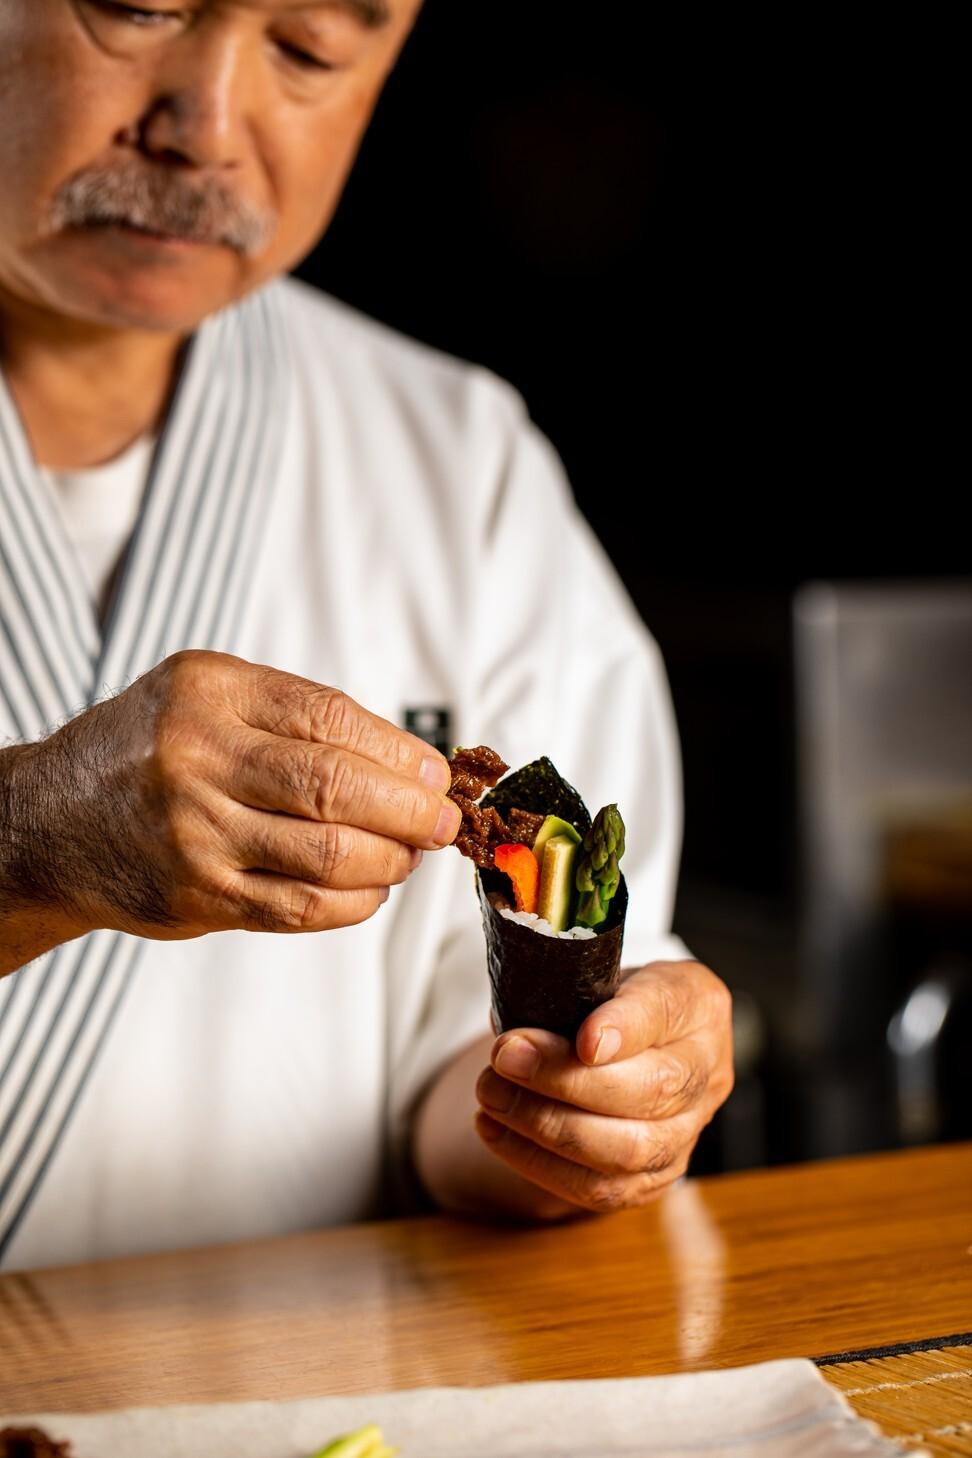 Waygu, the plant-based Wagyu beef alternative that fooled master chef Hidekazu Tojo